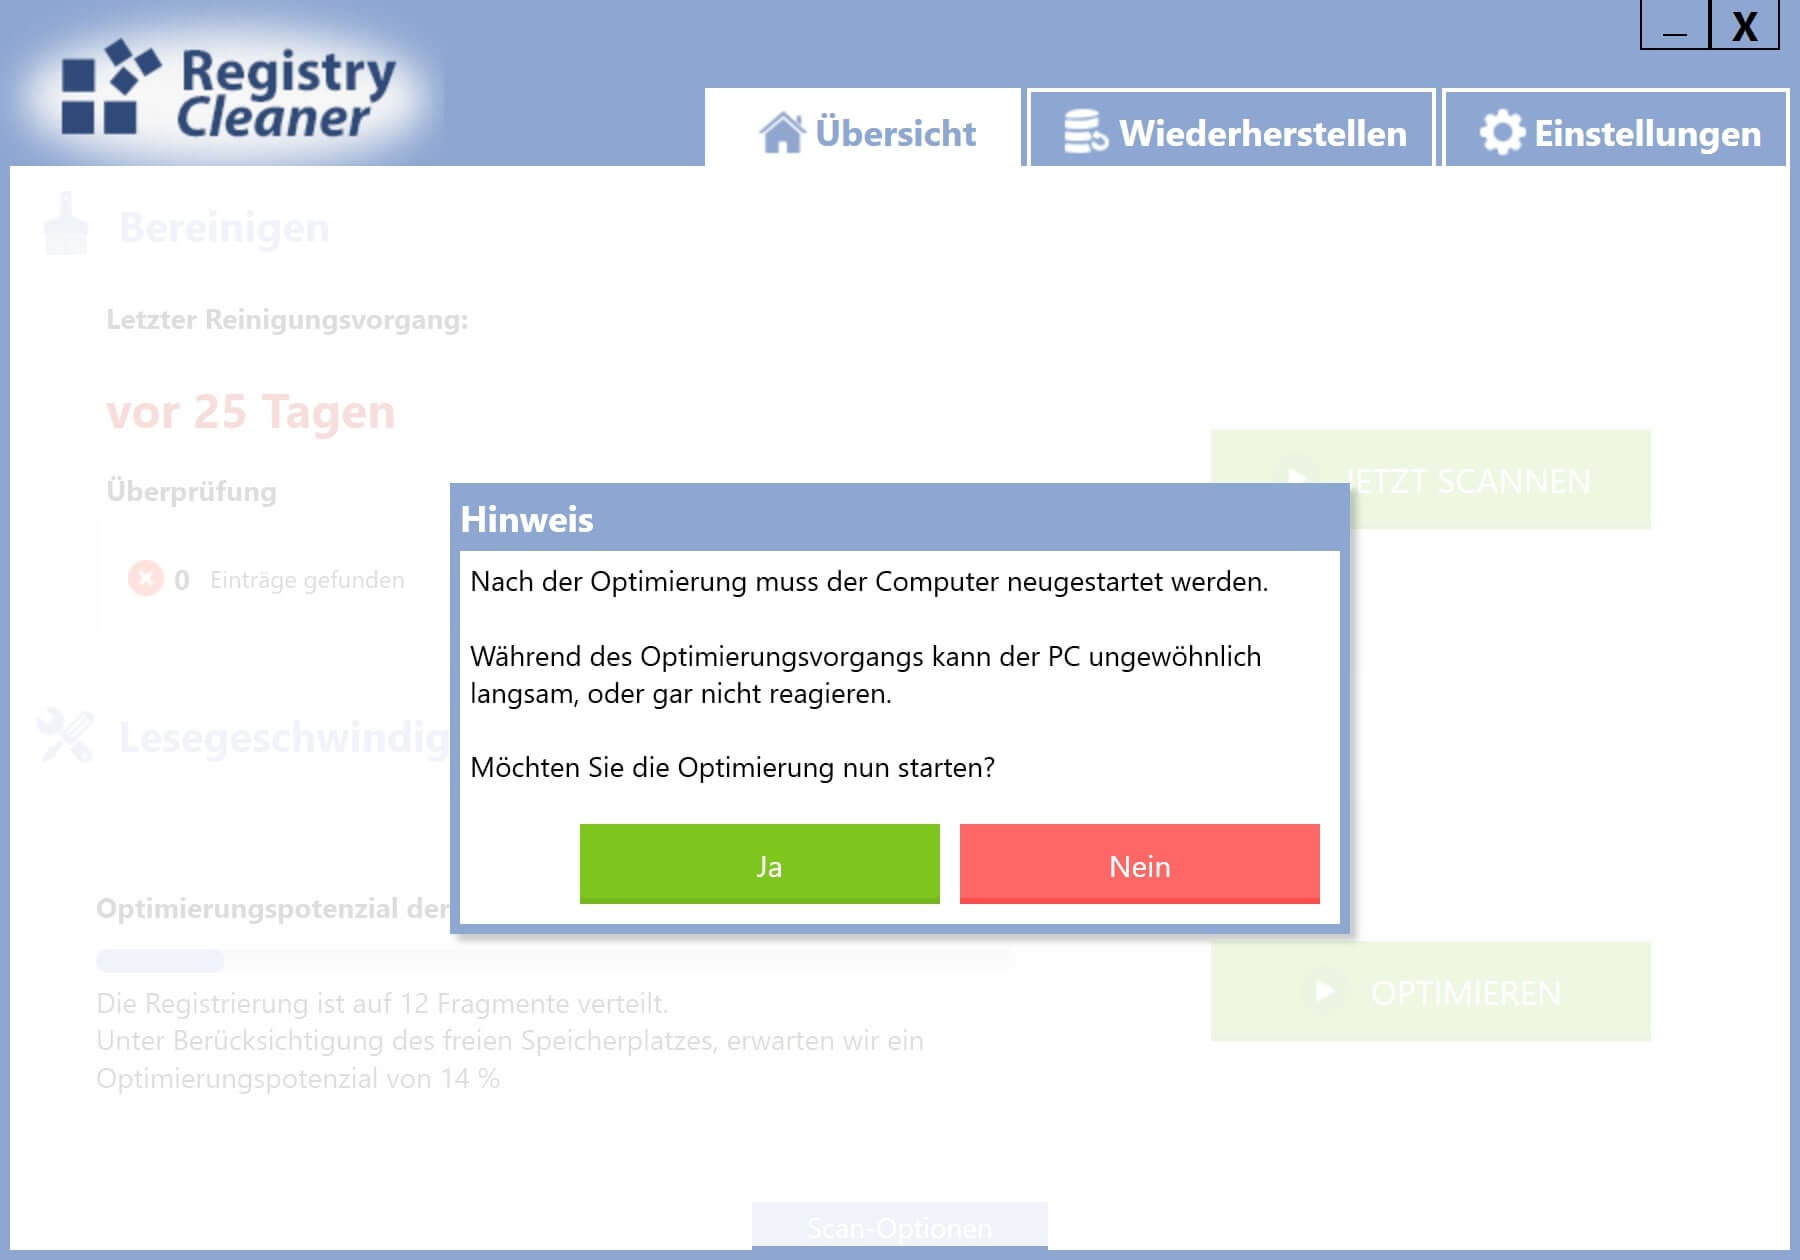 Registry defragmentieren - Optimierung starten